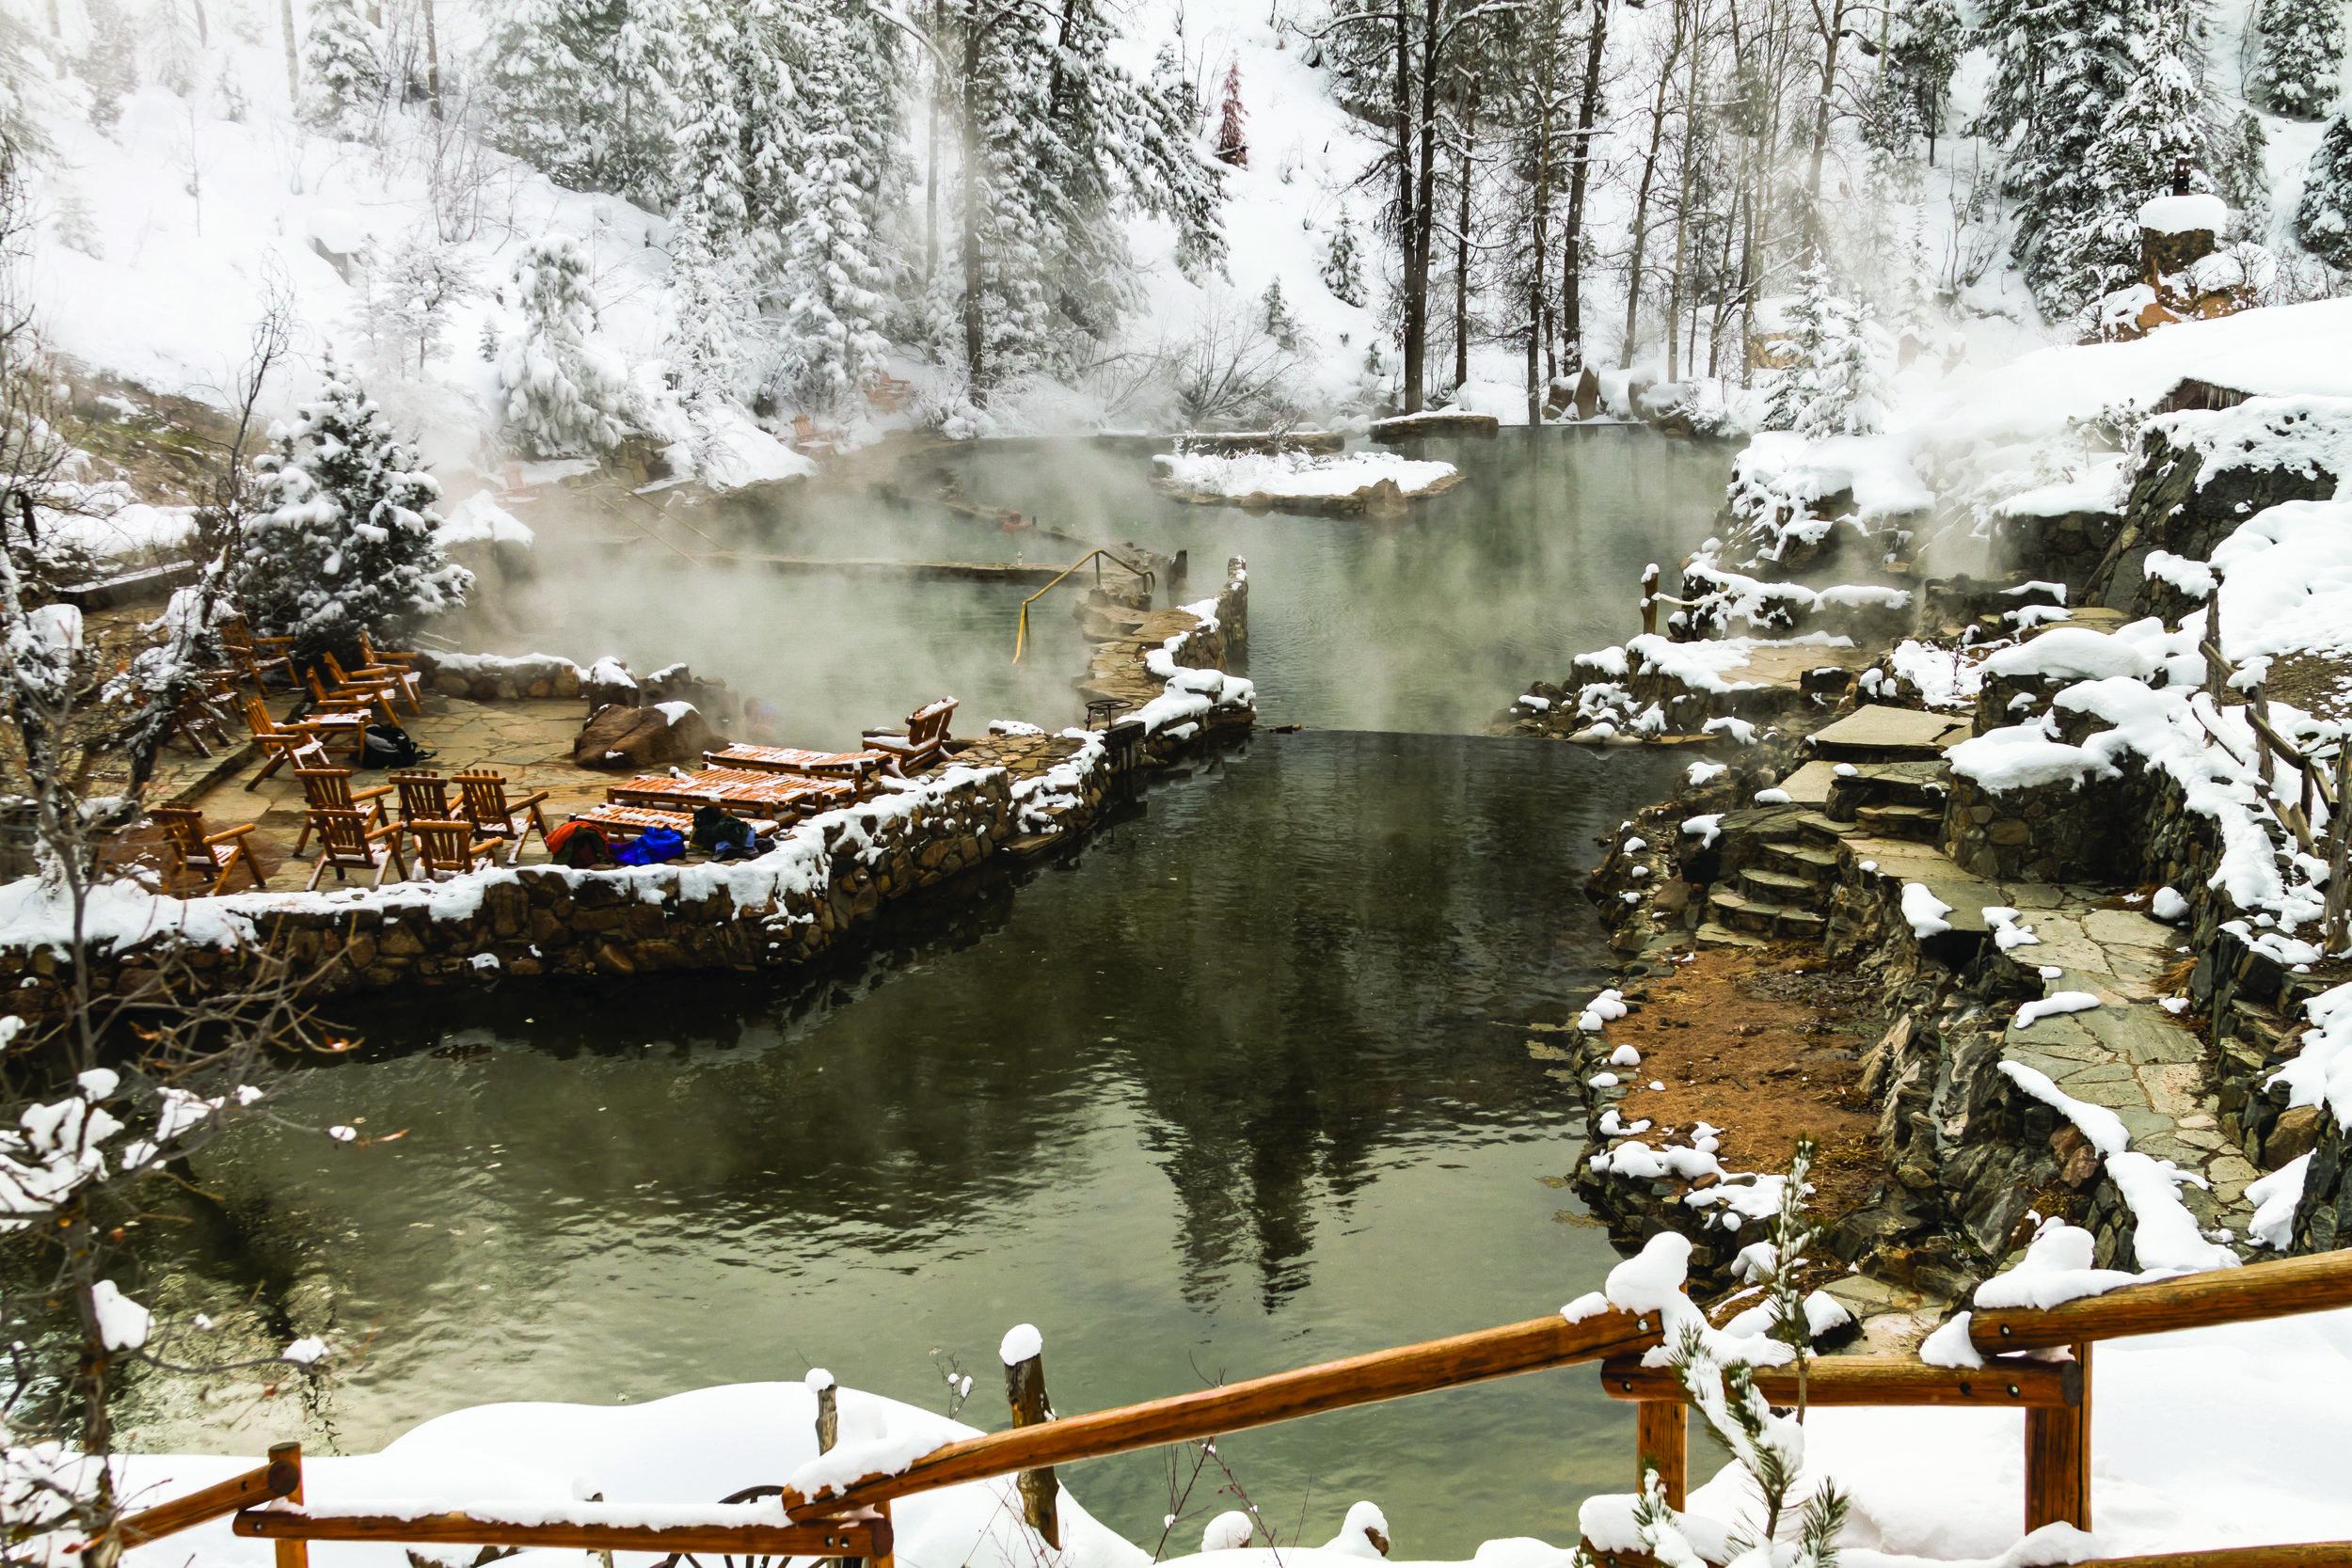 Strawberry Park Hot Springs 123RF/Teri Virbickis